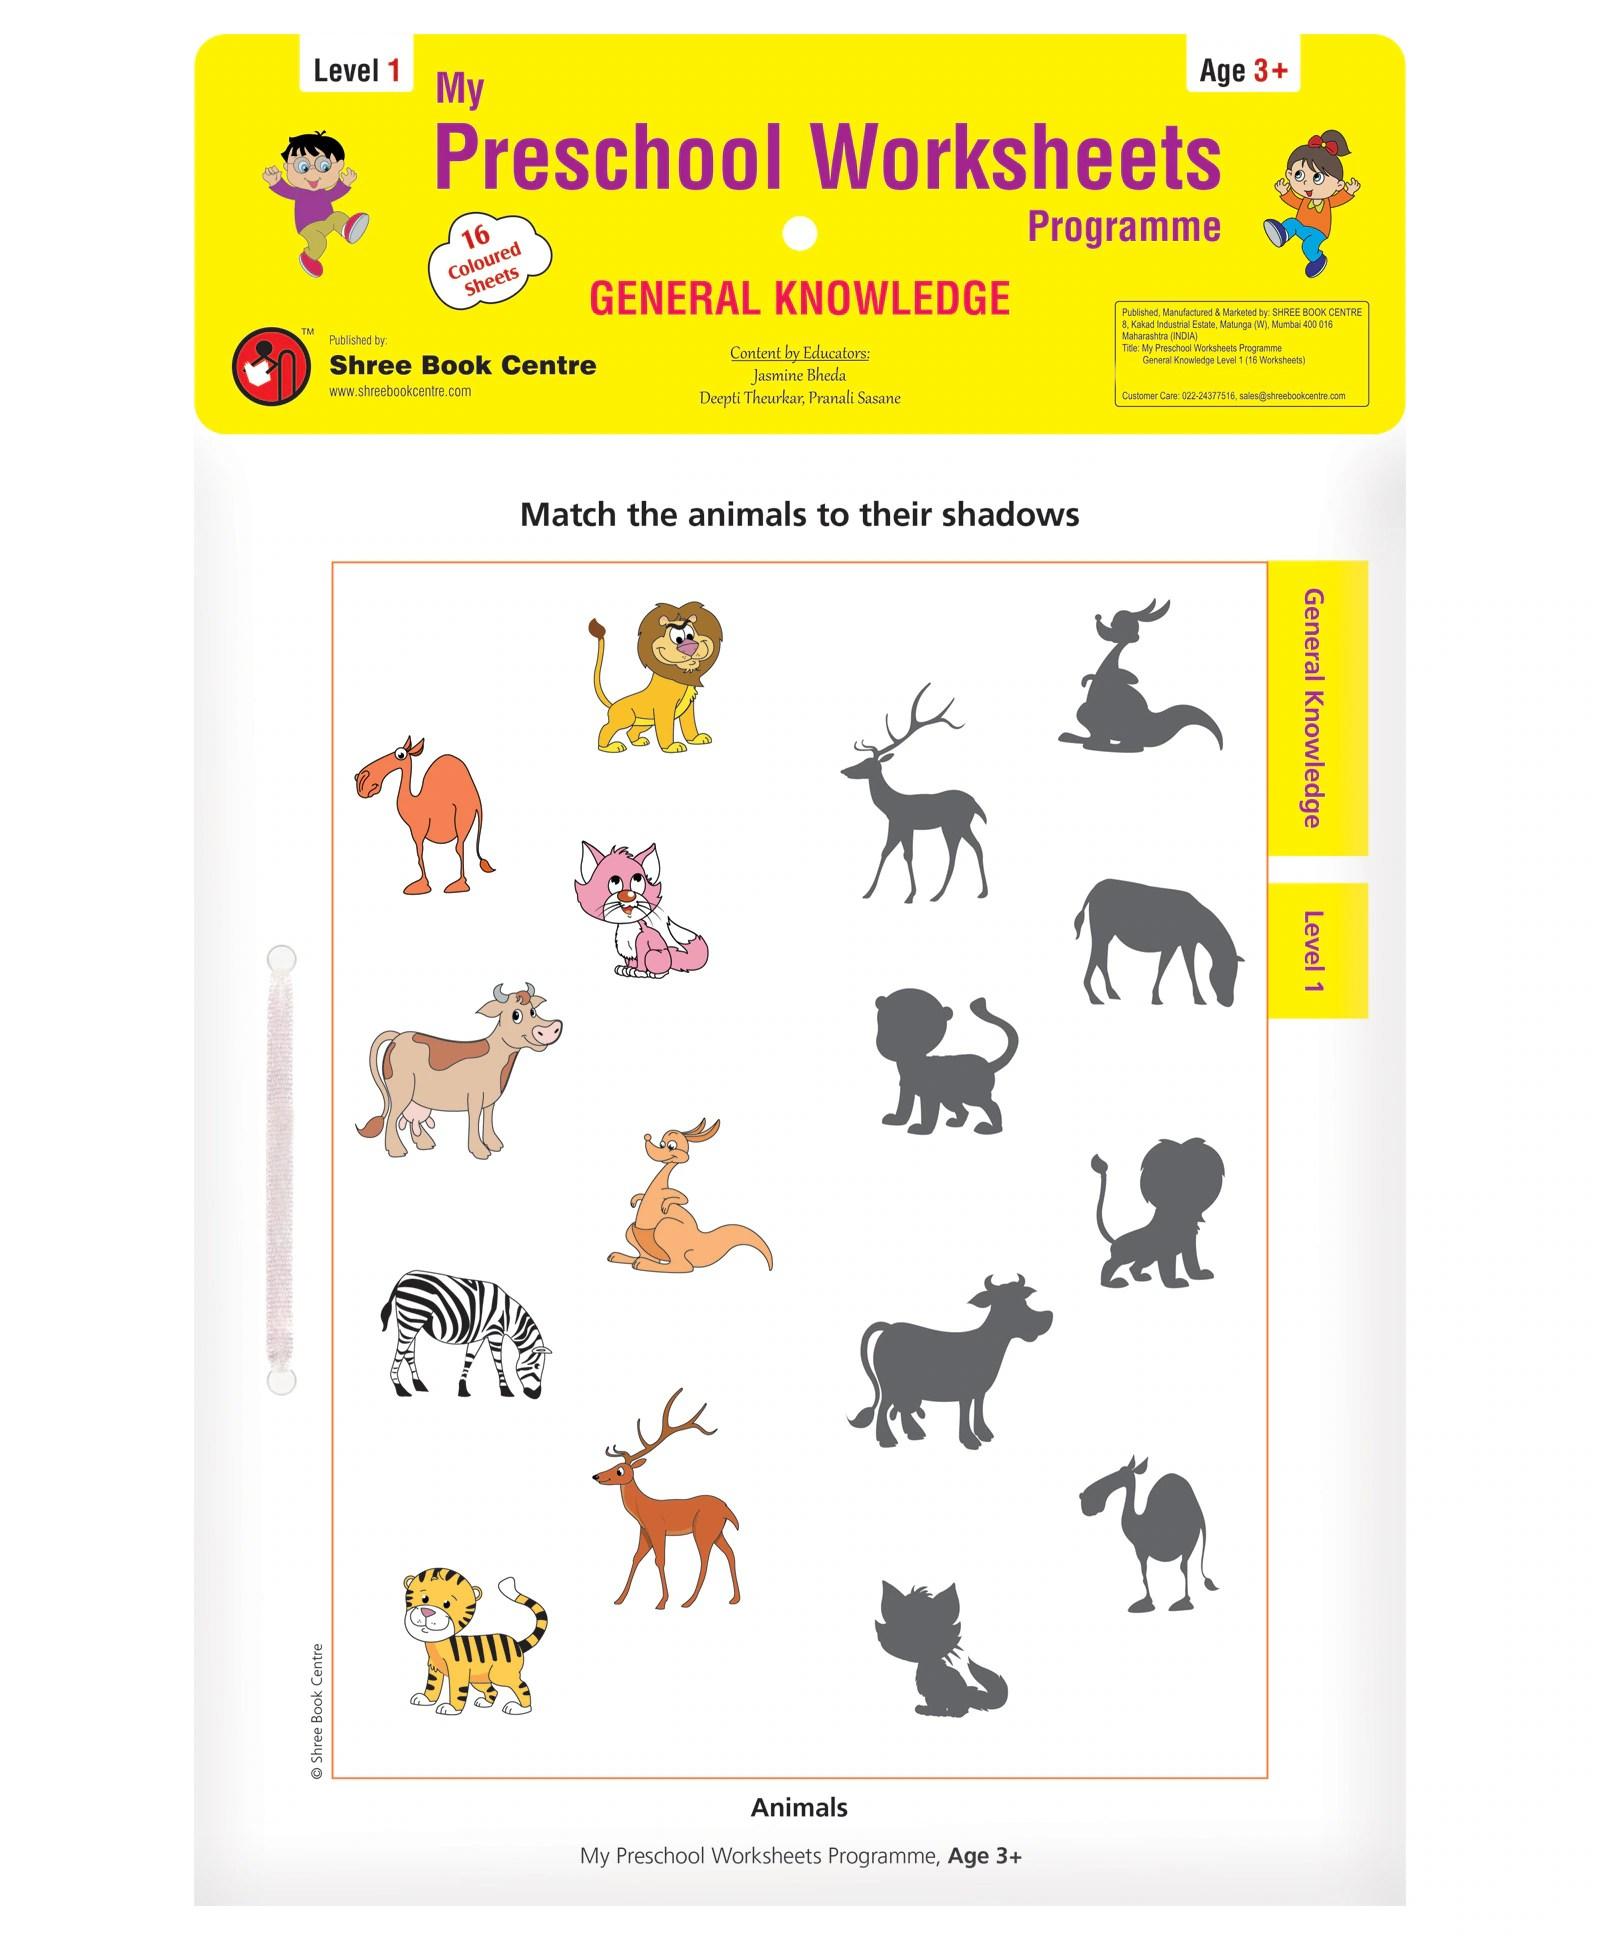 My 1st Preschool Worksheets General Knowledge Level 1 Age